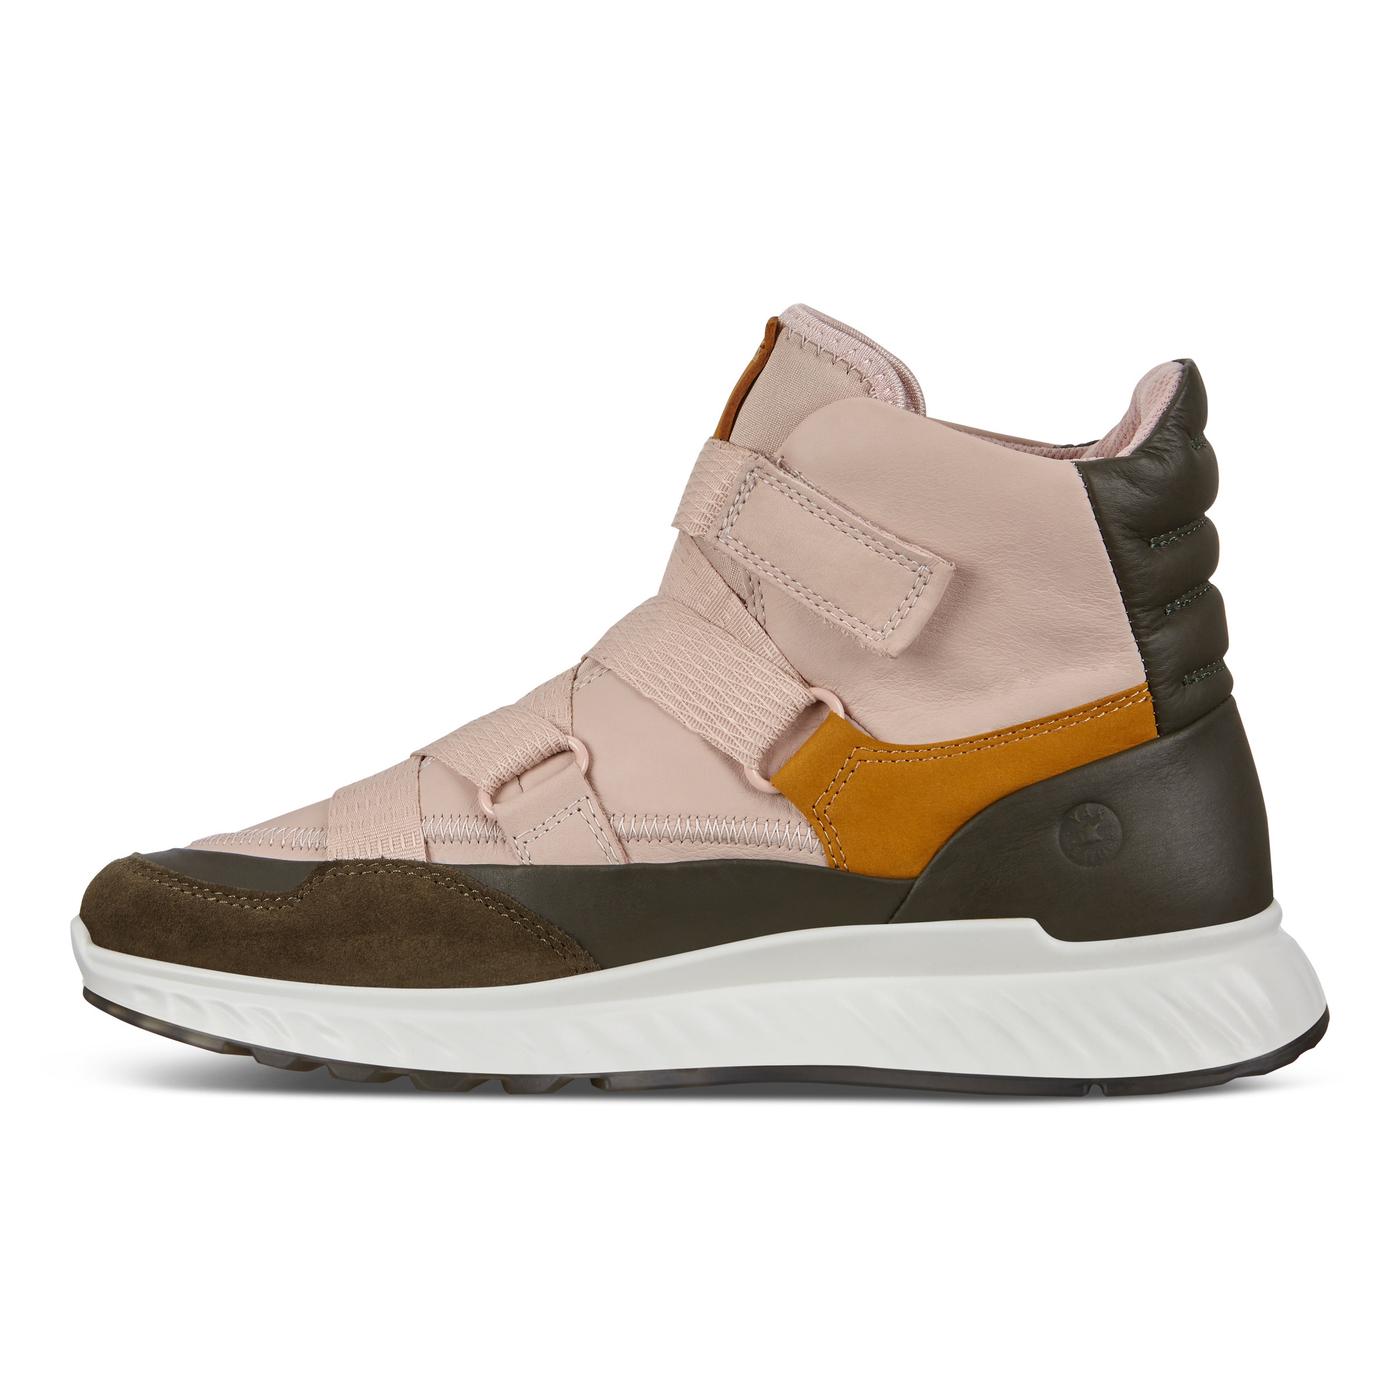 ECCO ST.1 Womens High Cut Strap Sneaker